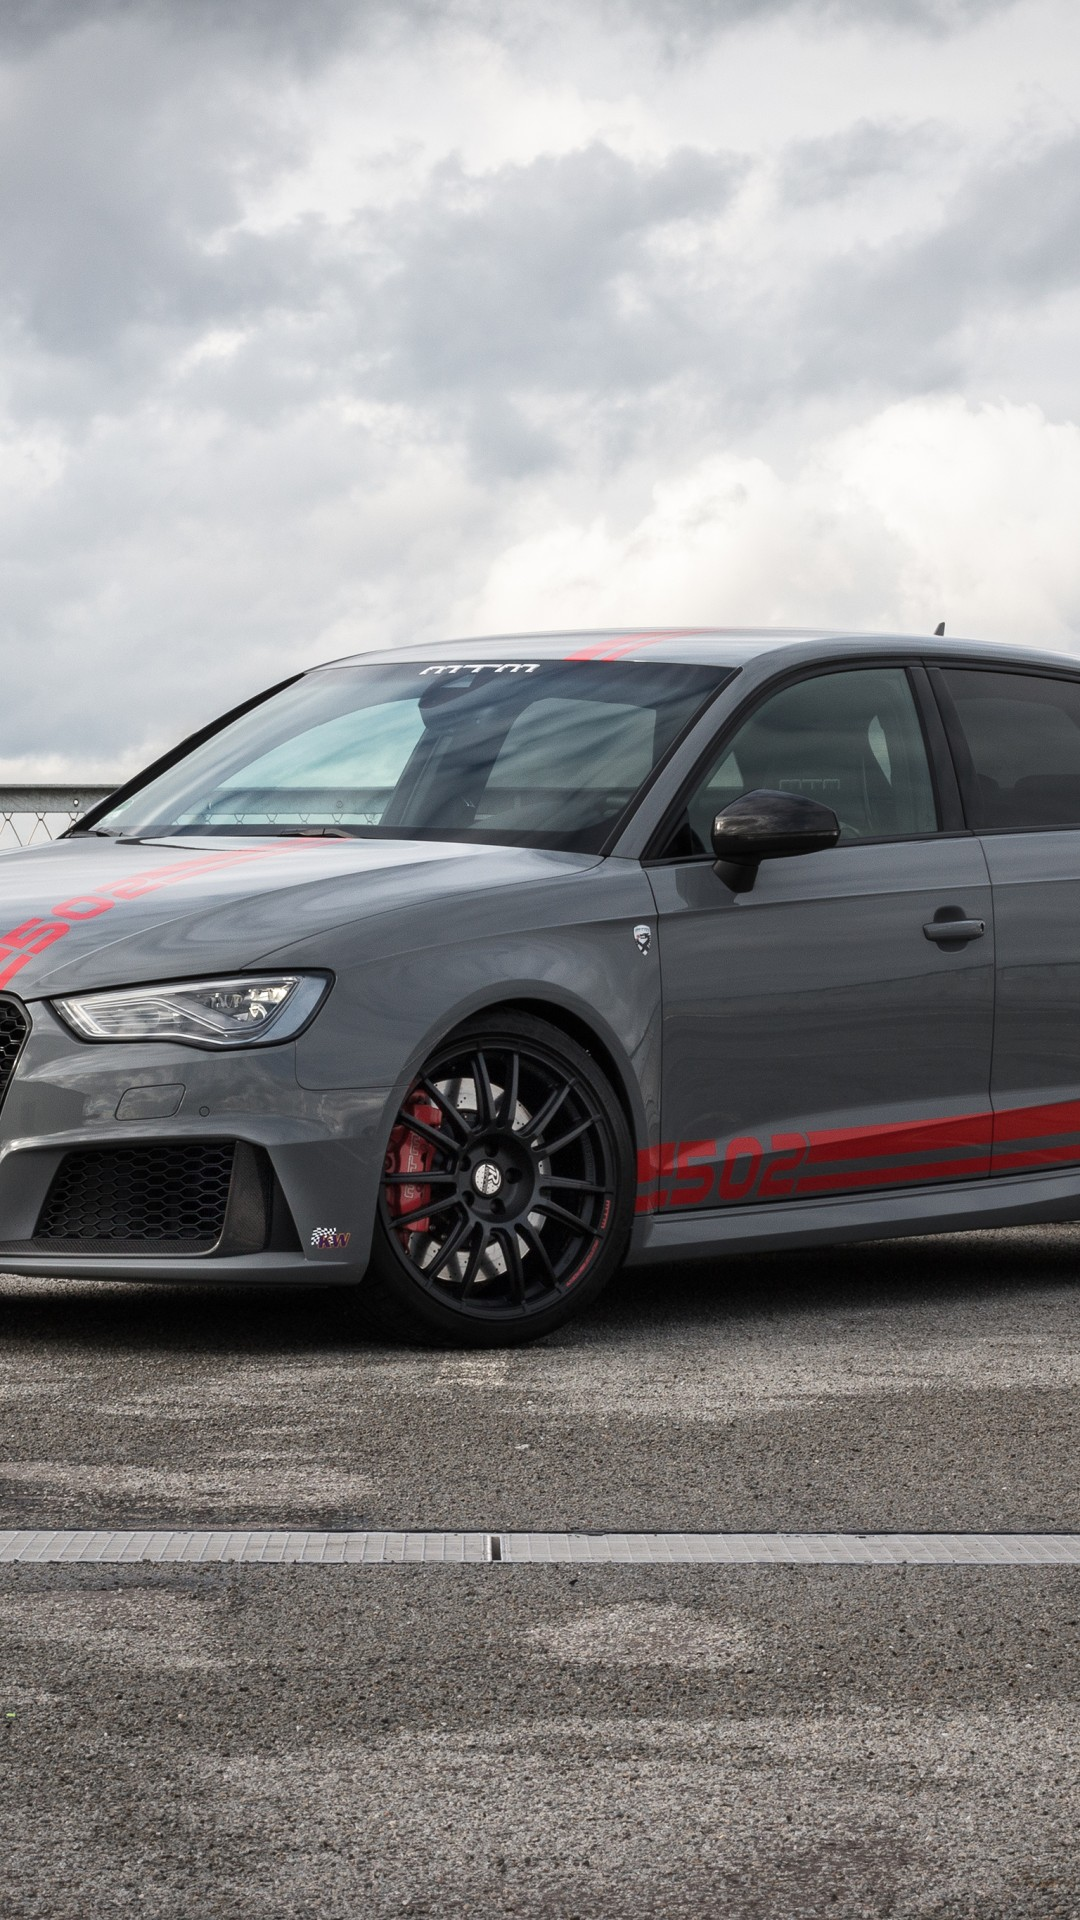 Wallpaper Mtm Audi Rs8 Sportback Geneva Auto Show 2016